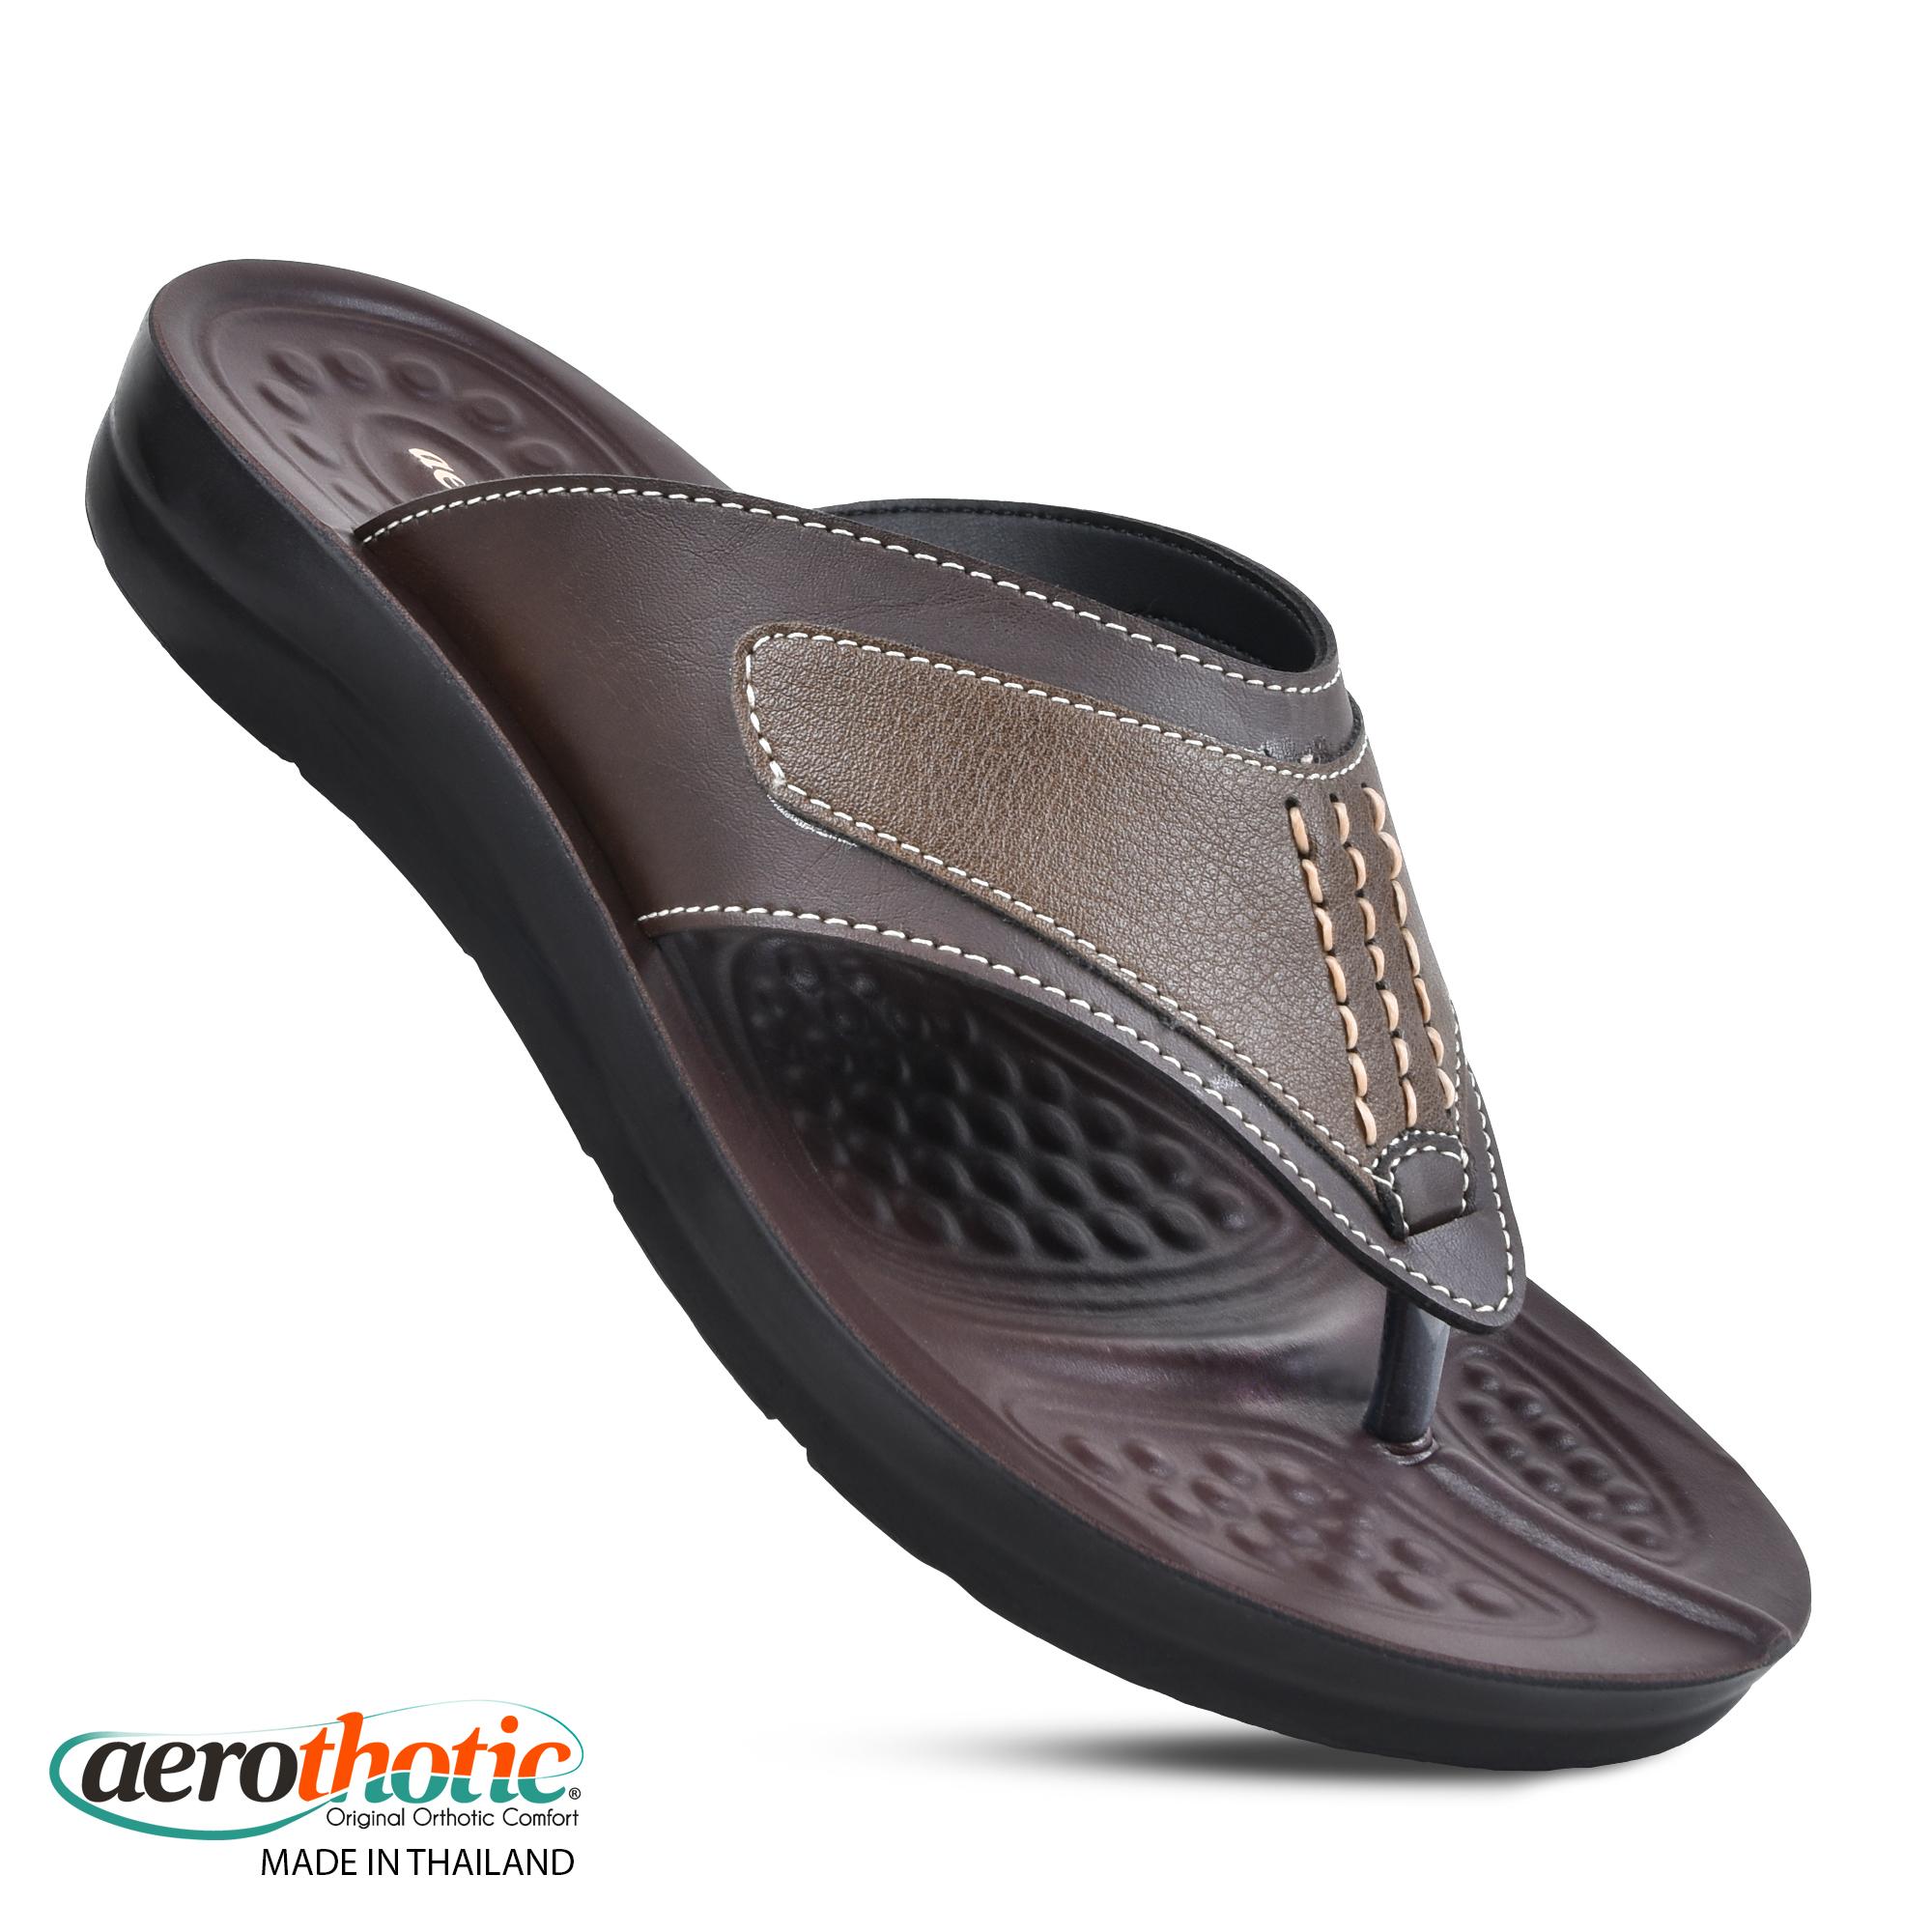 AEROTHOTIC Men's Durable Fashion Flip Flops - Original Thailand Imported - M0602